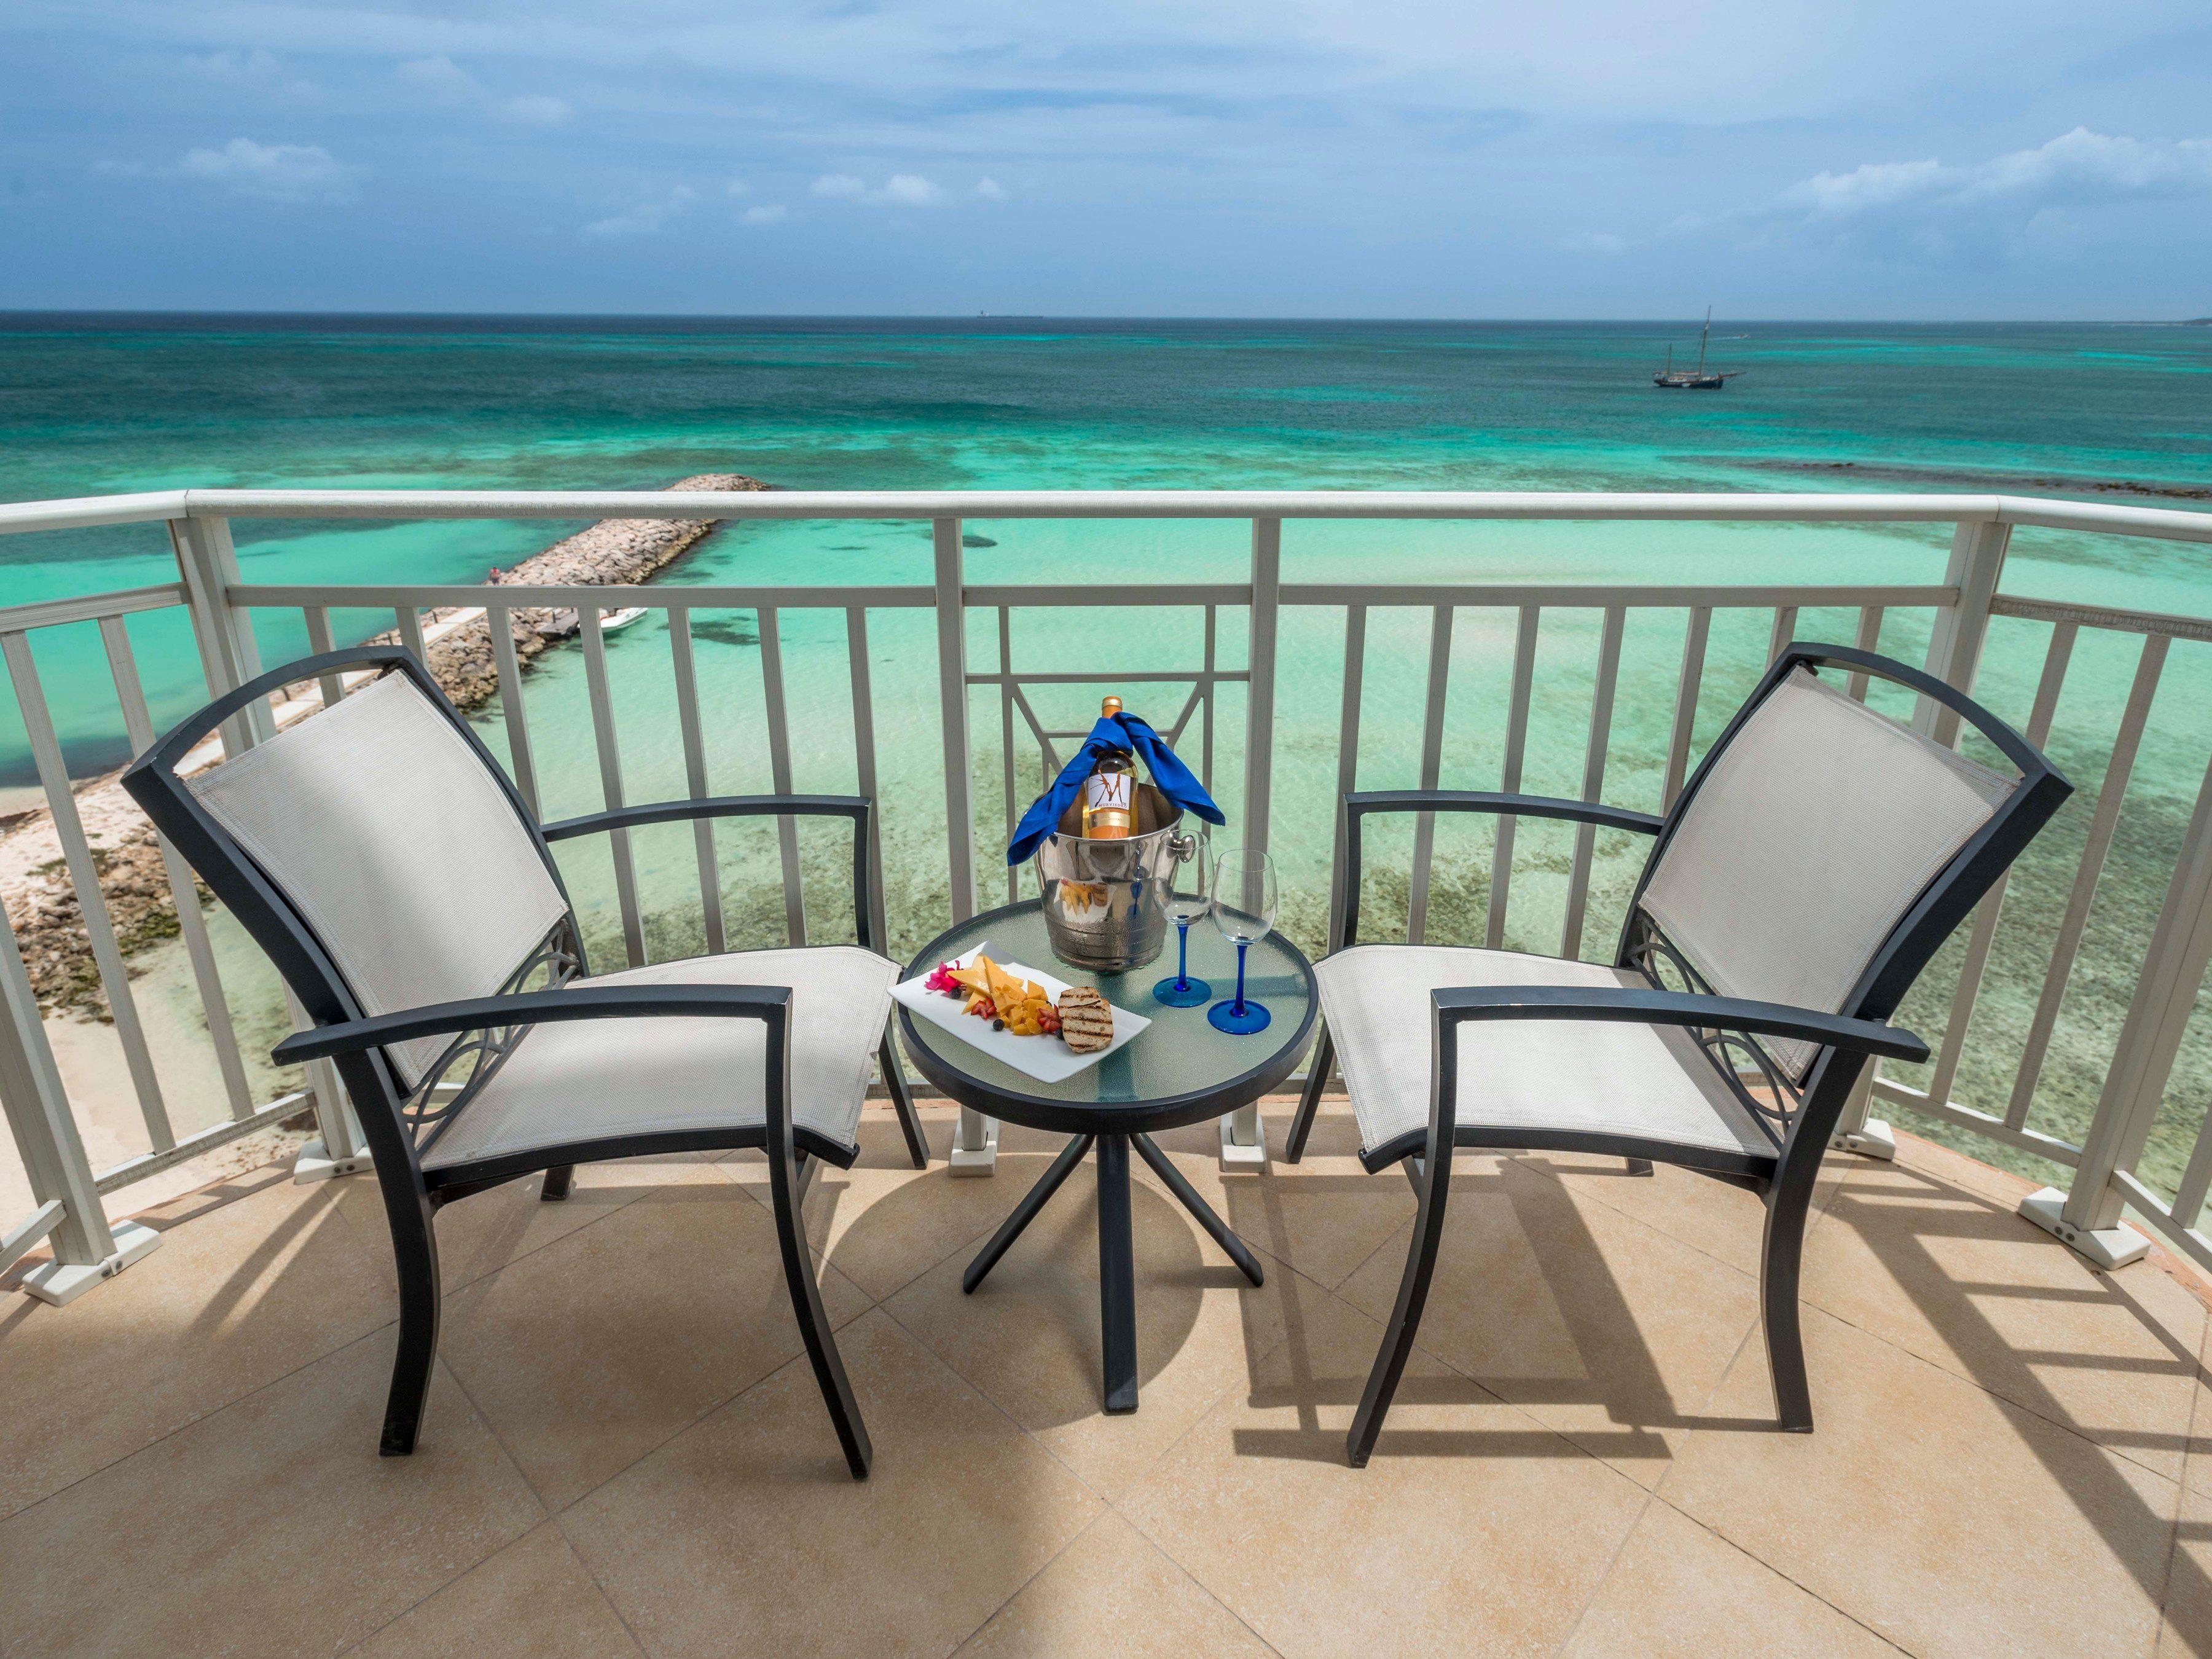 Divi Phoenix Beach Resort in Aruba